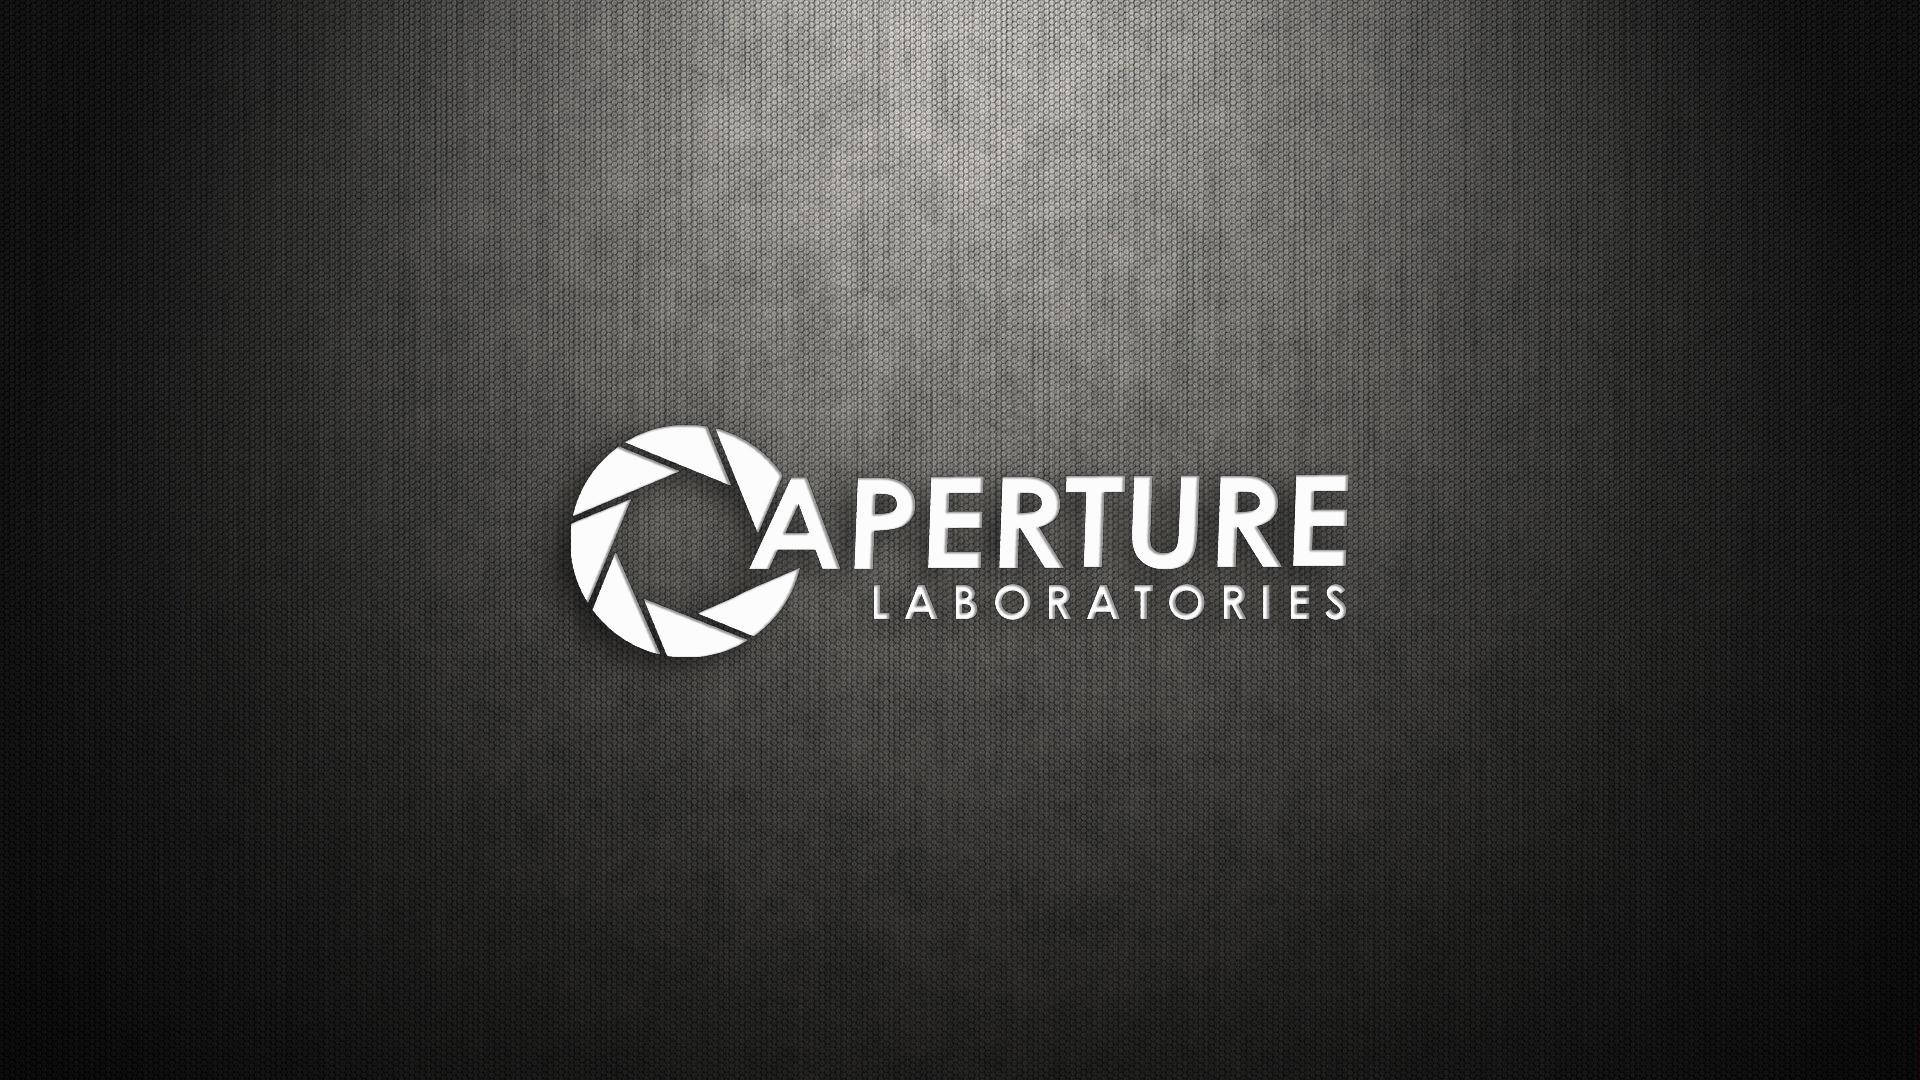 wallpaper.wiki-Aperture-Laboratories-Wallpaper-Download-Free-PIC-